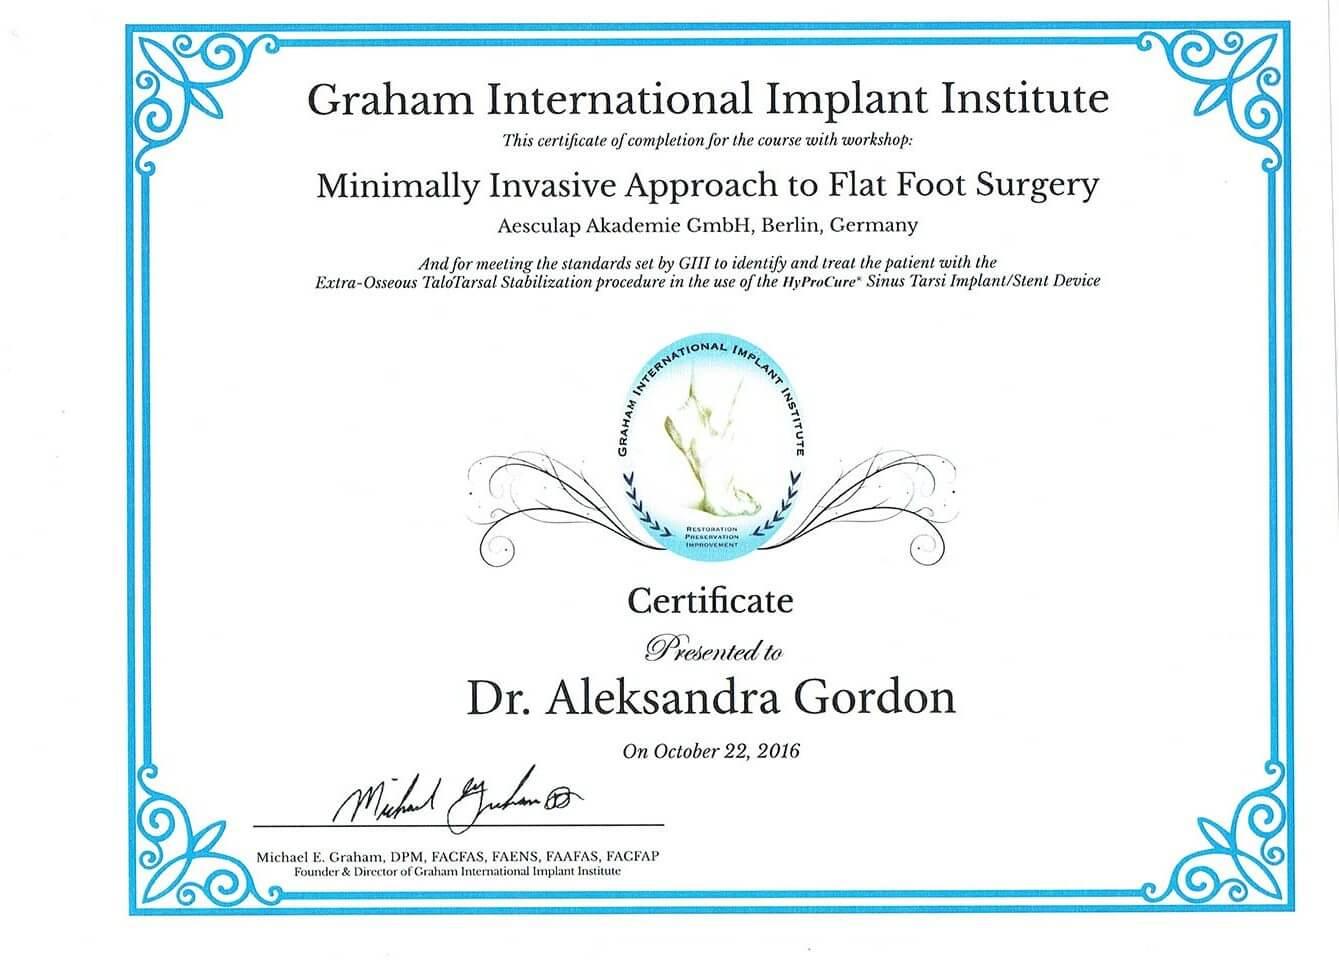 aleksandra-gordon-certyfika-dyplom (2)